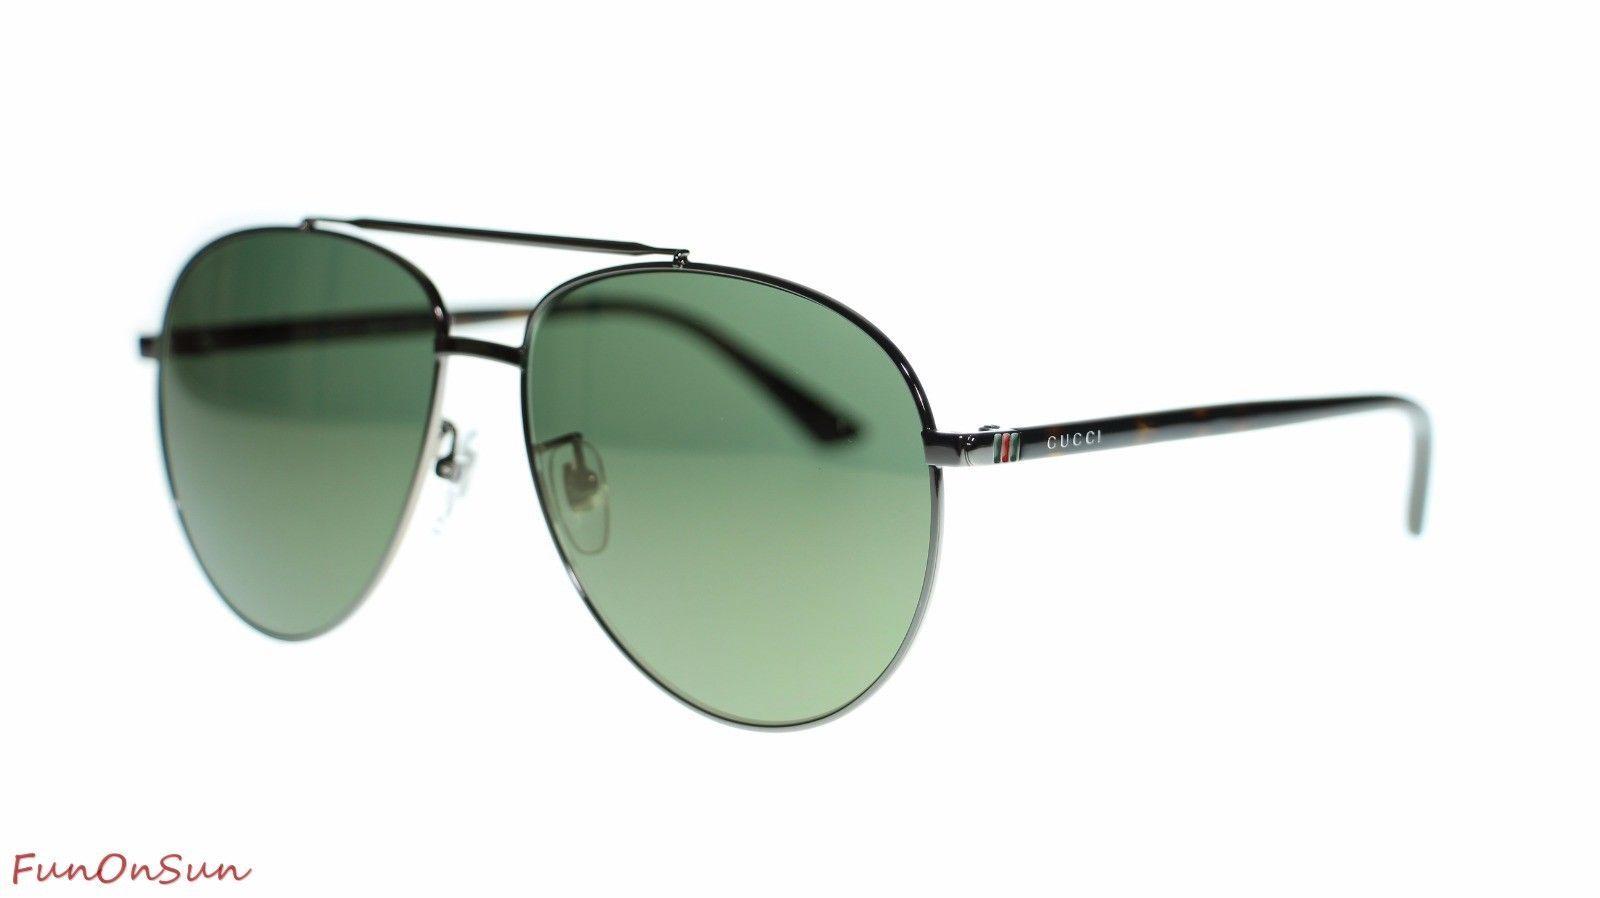 21320b6949 S l1600. S l1600. Previous. Gucci Mens Aviator Sunglasses GG0043SA 003  Ruthenium Havana Gold Lens 61mm